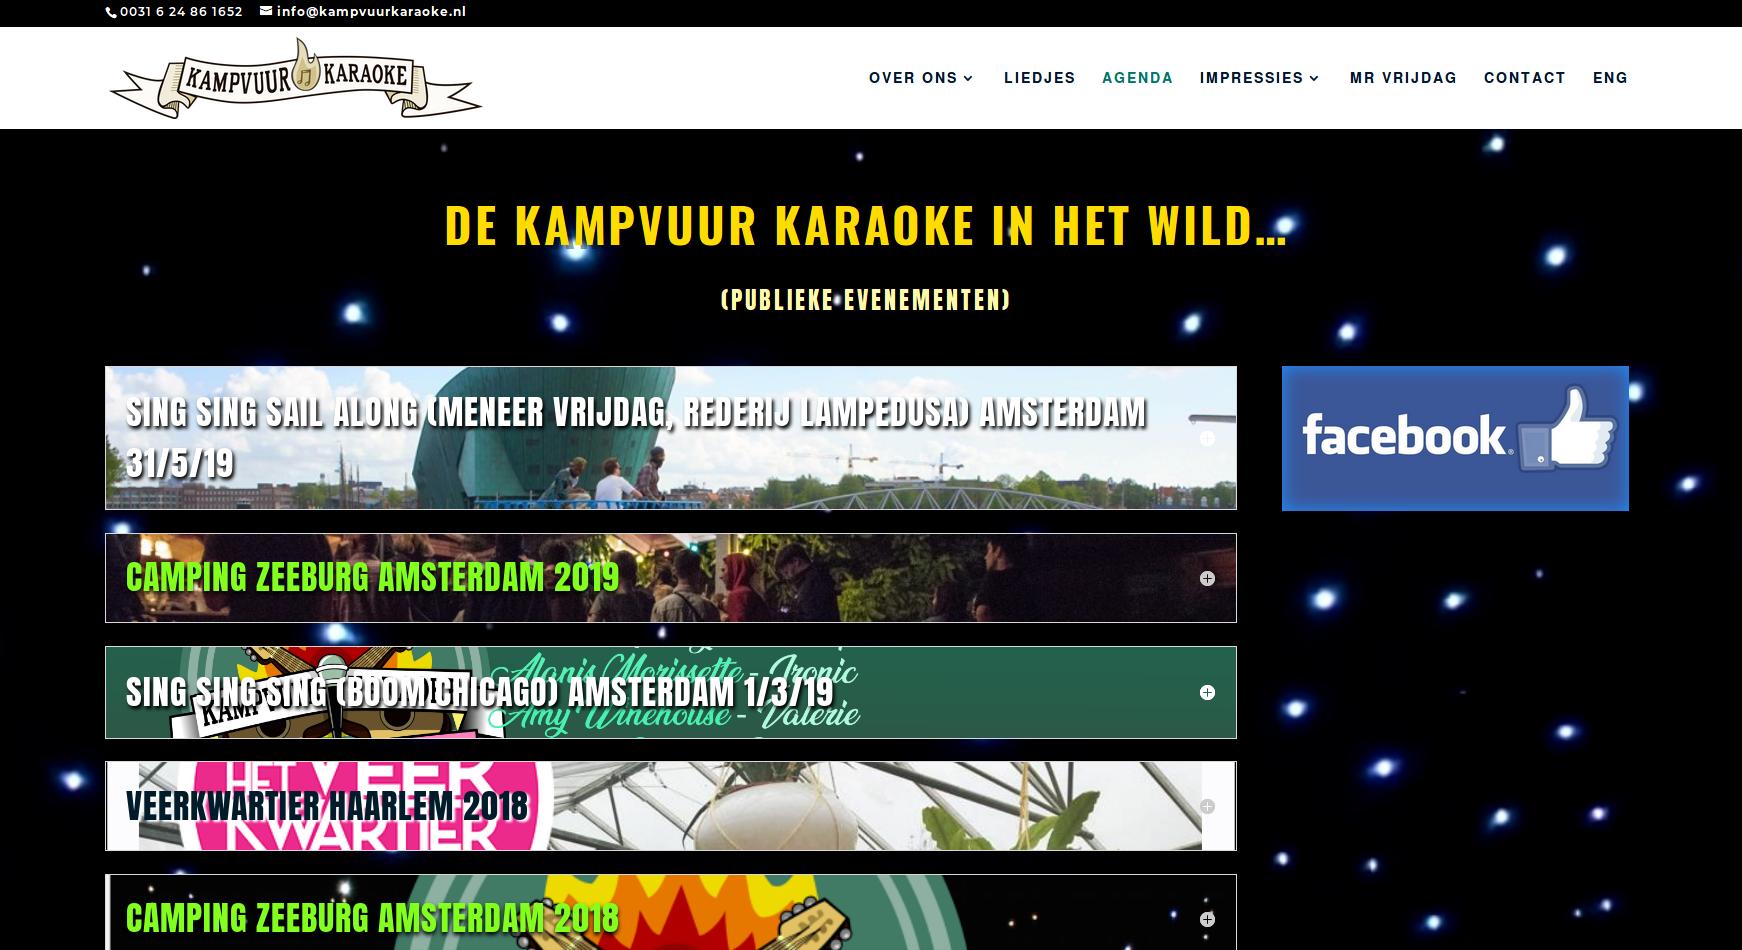 KAMPVUUR KARAOKE event page